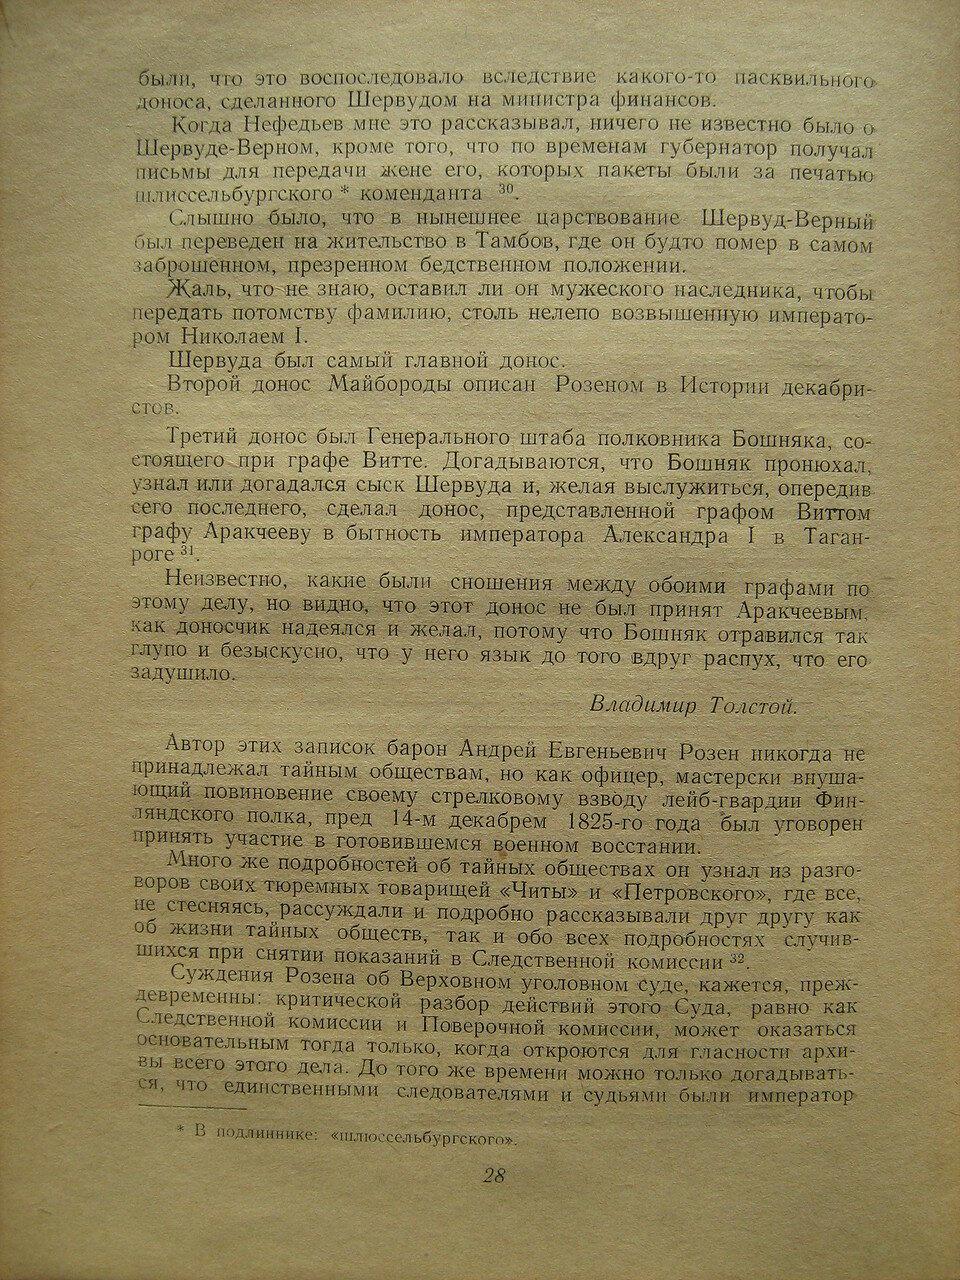 https://img-fotki.yandex.ru/get/931298/199368979.de/0_21f74a_be0d1c09_XXXL.jpg